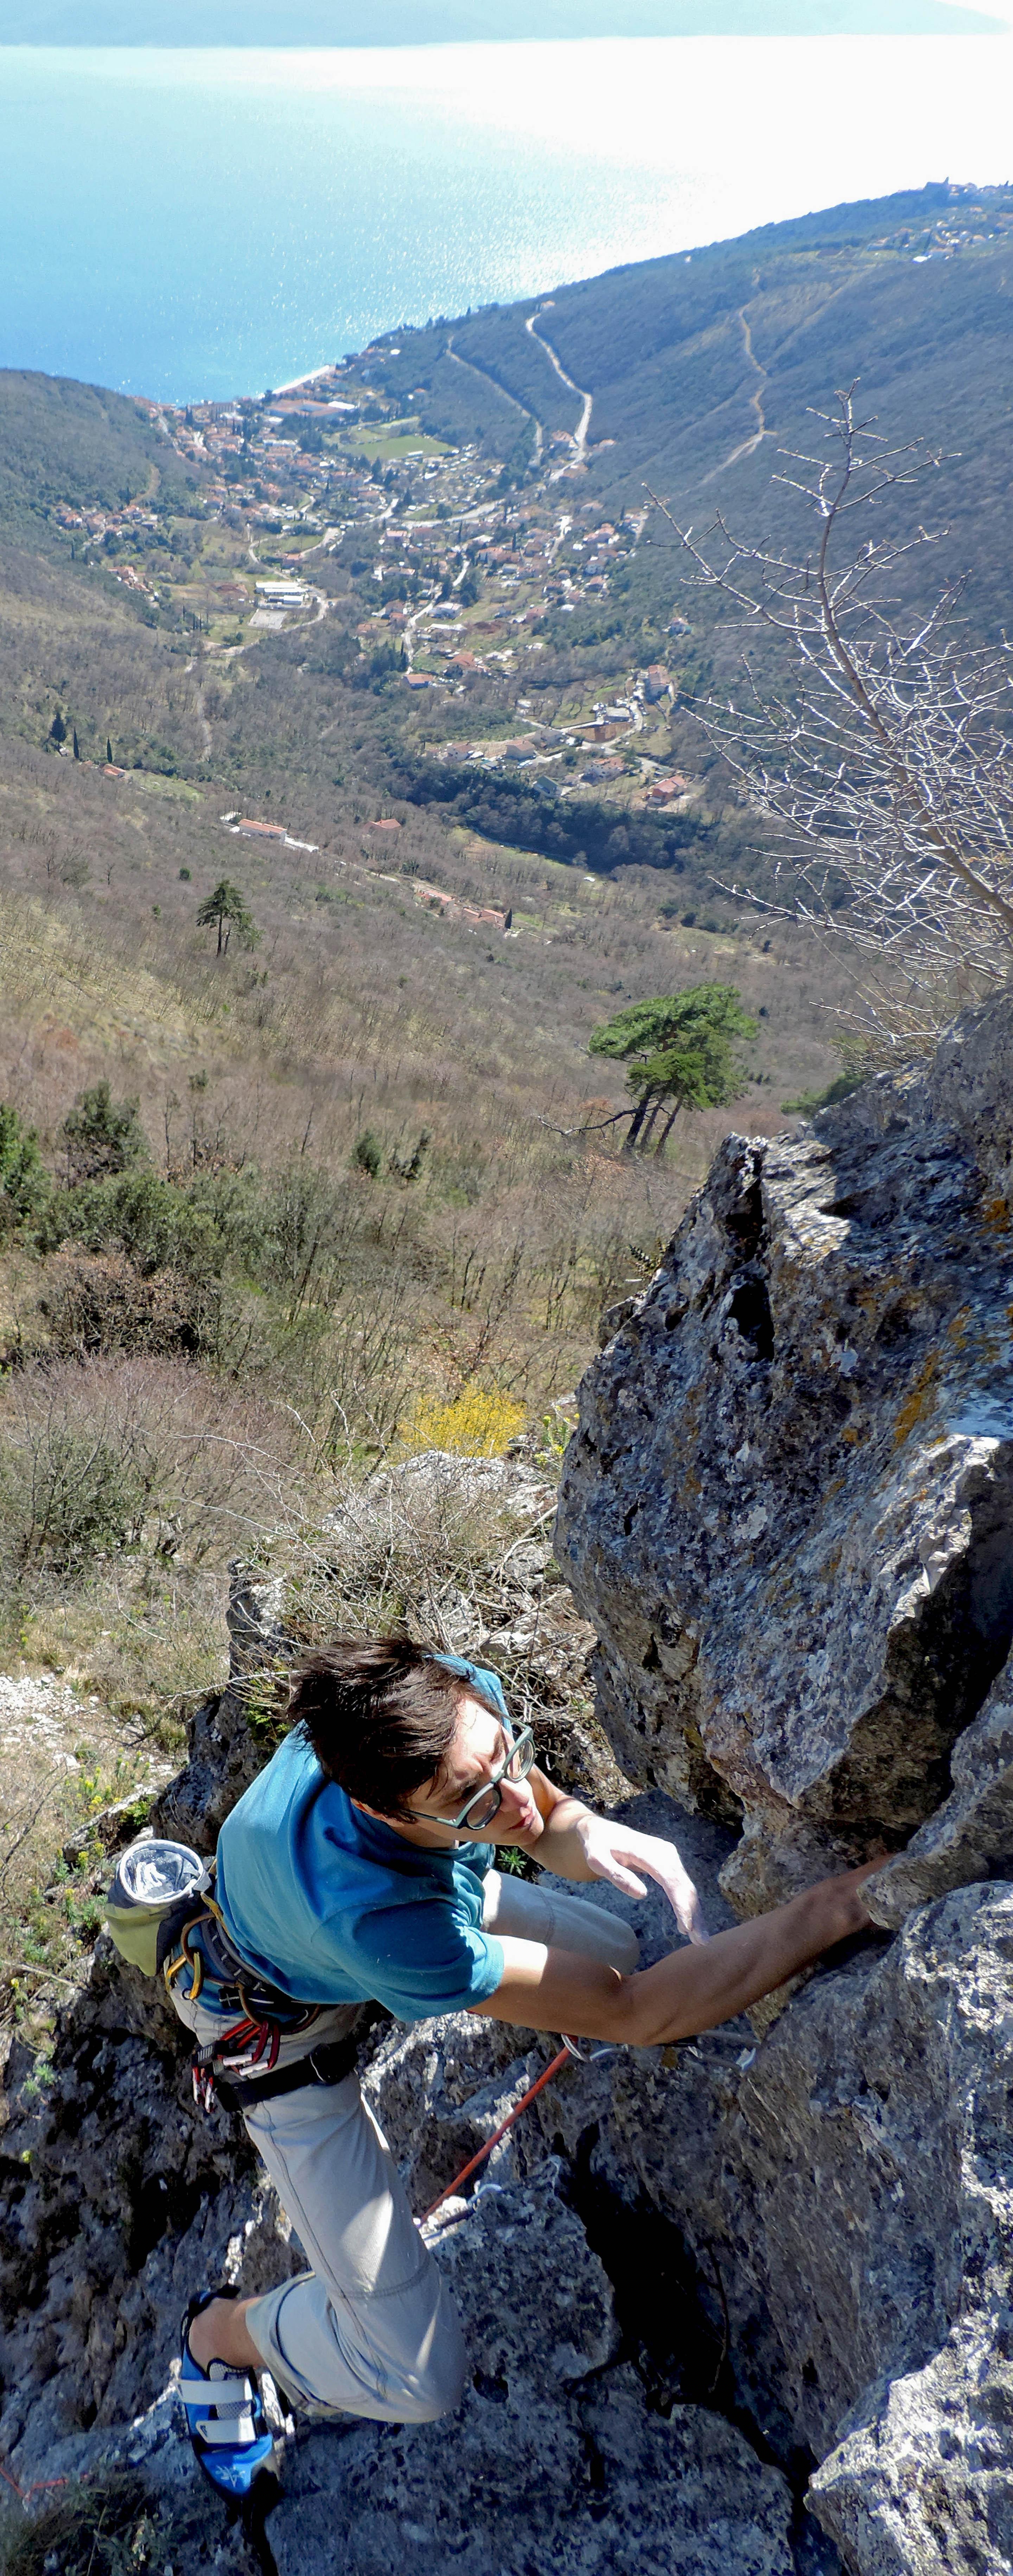 Mošćenička draga, Istria, Croatia